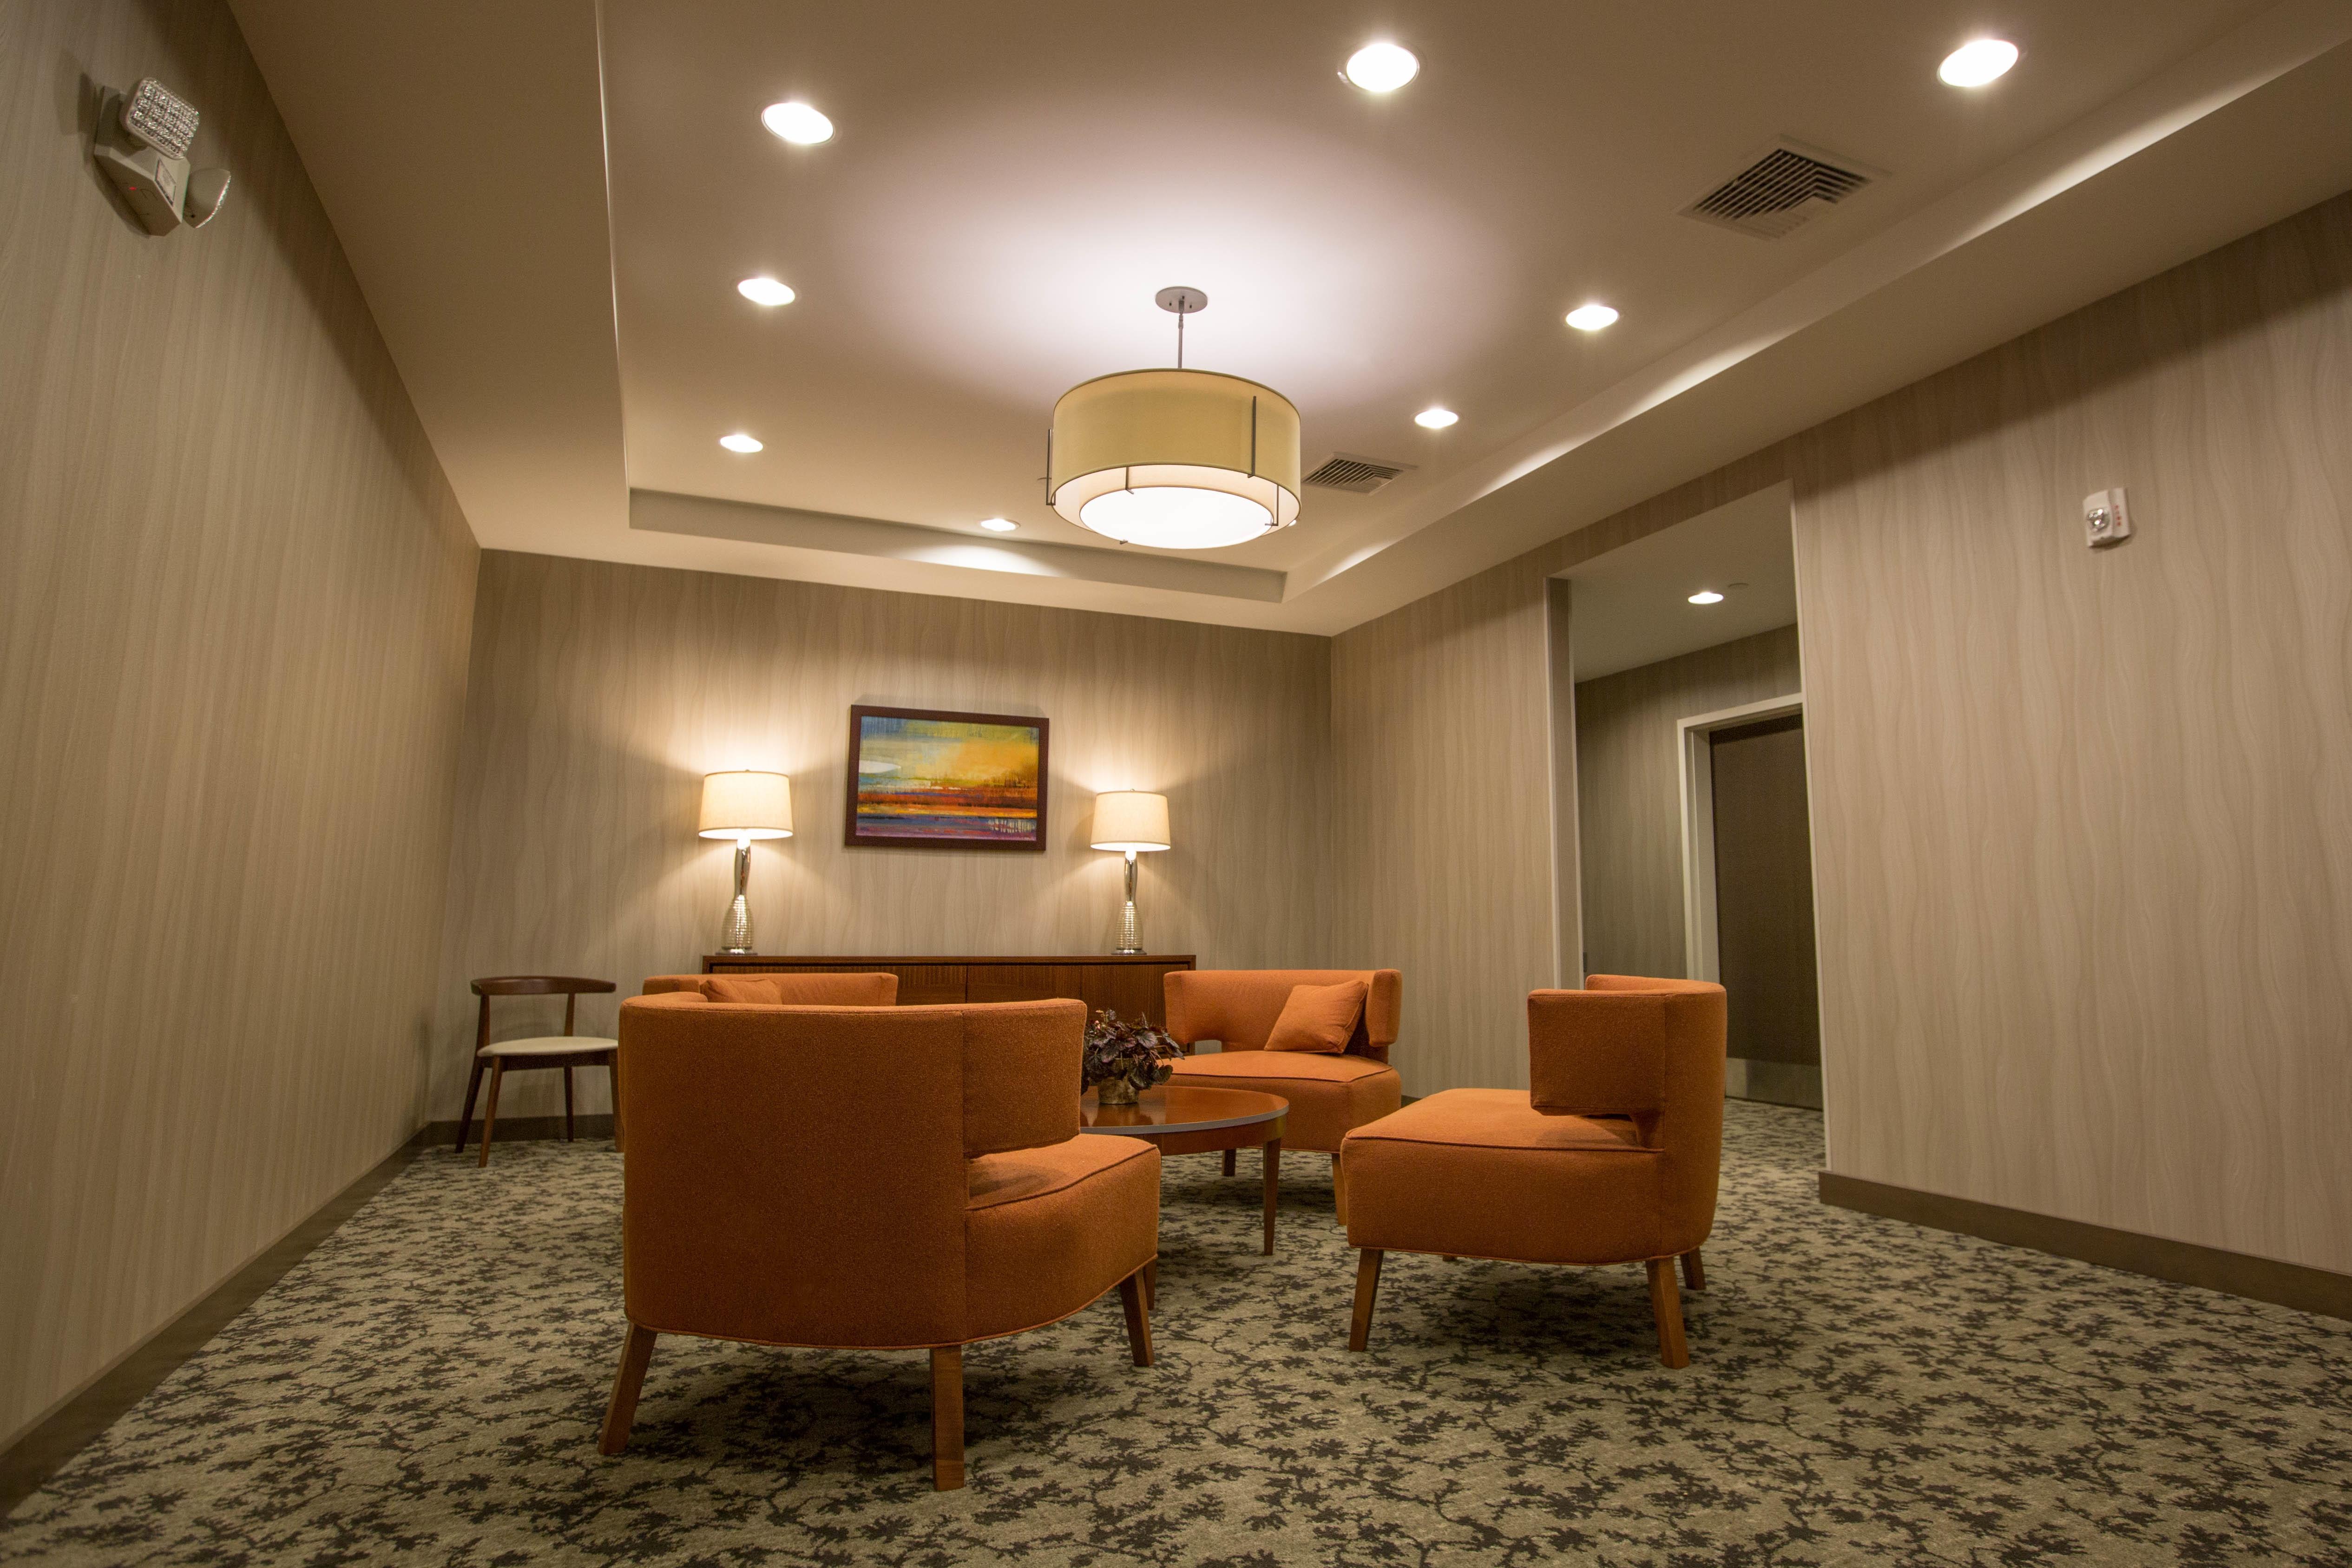 Gratis Afbeeldingen : plafond, kantoor, woonkamer, kelder, kamer ...